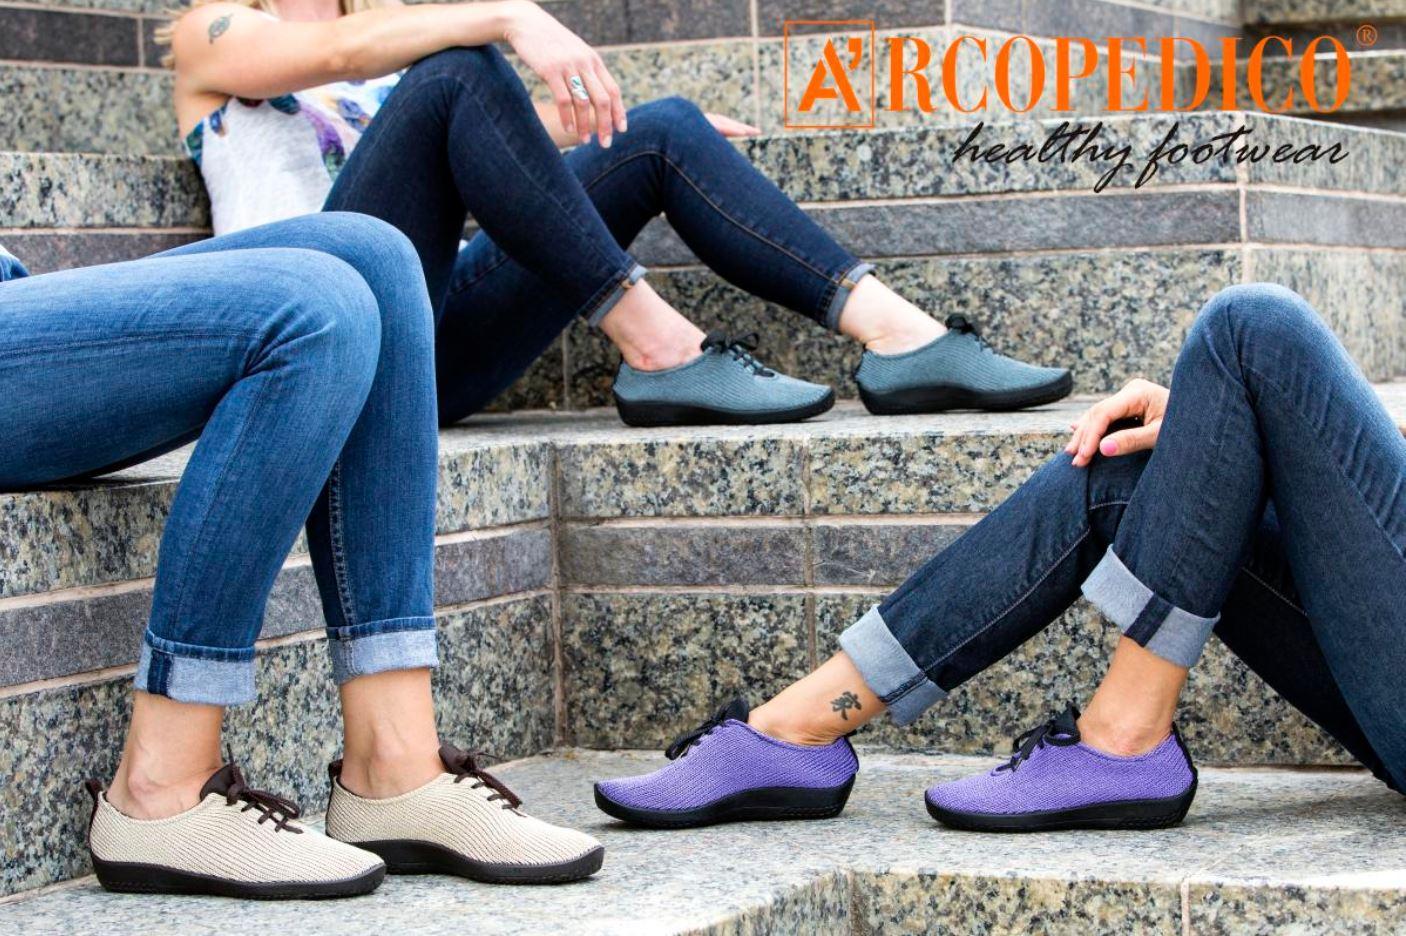 Scarpe Arcopedico plantare anatomico